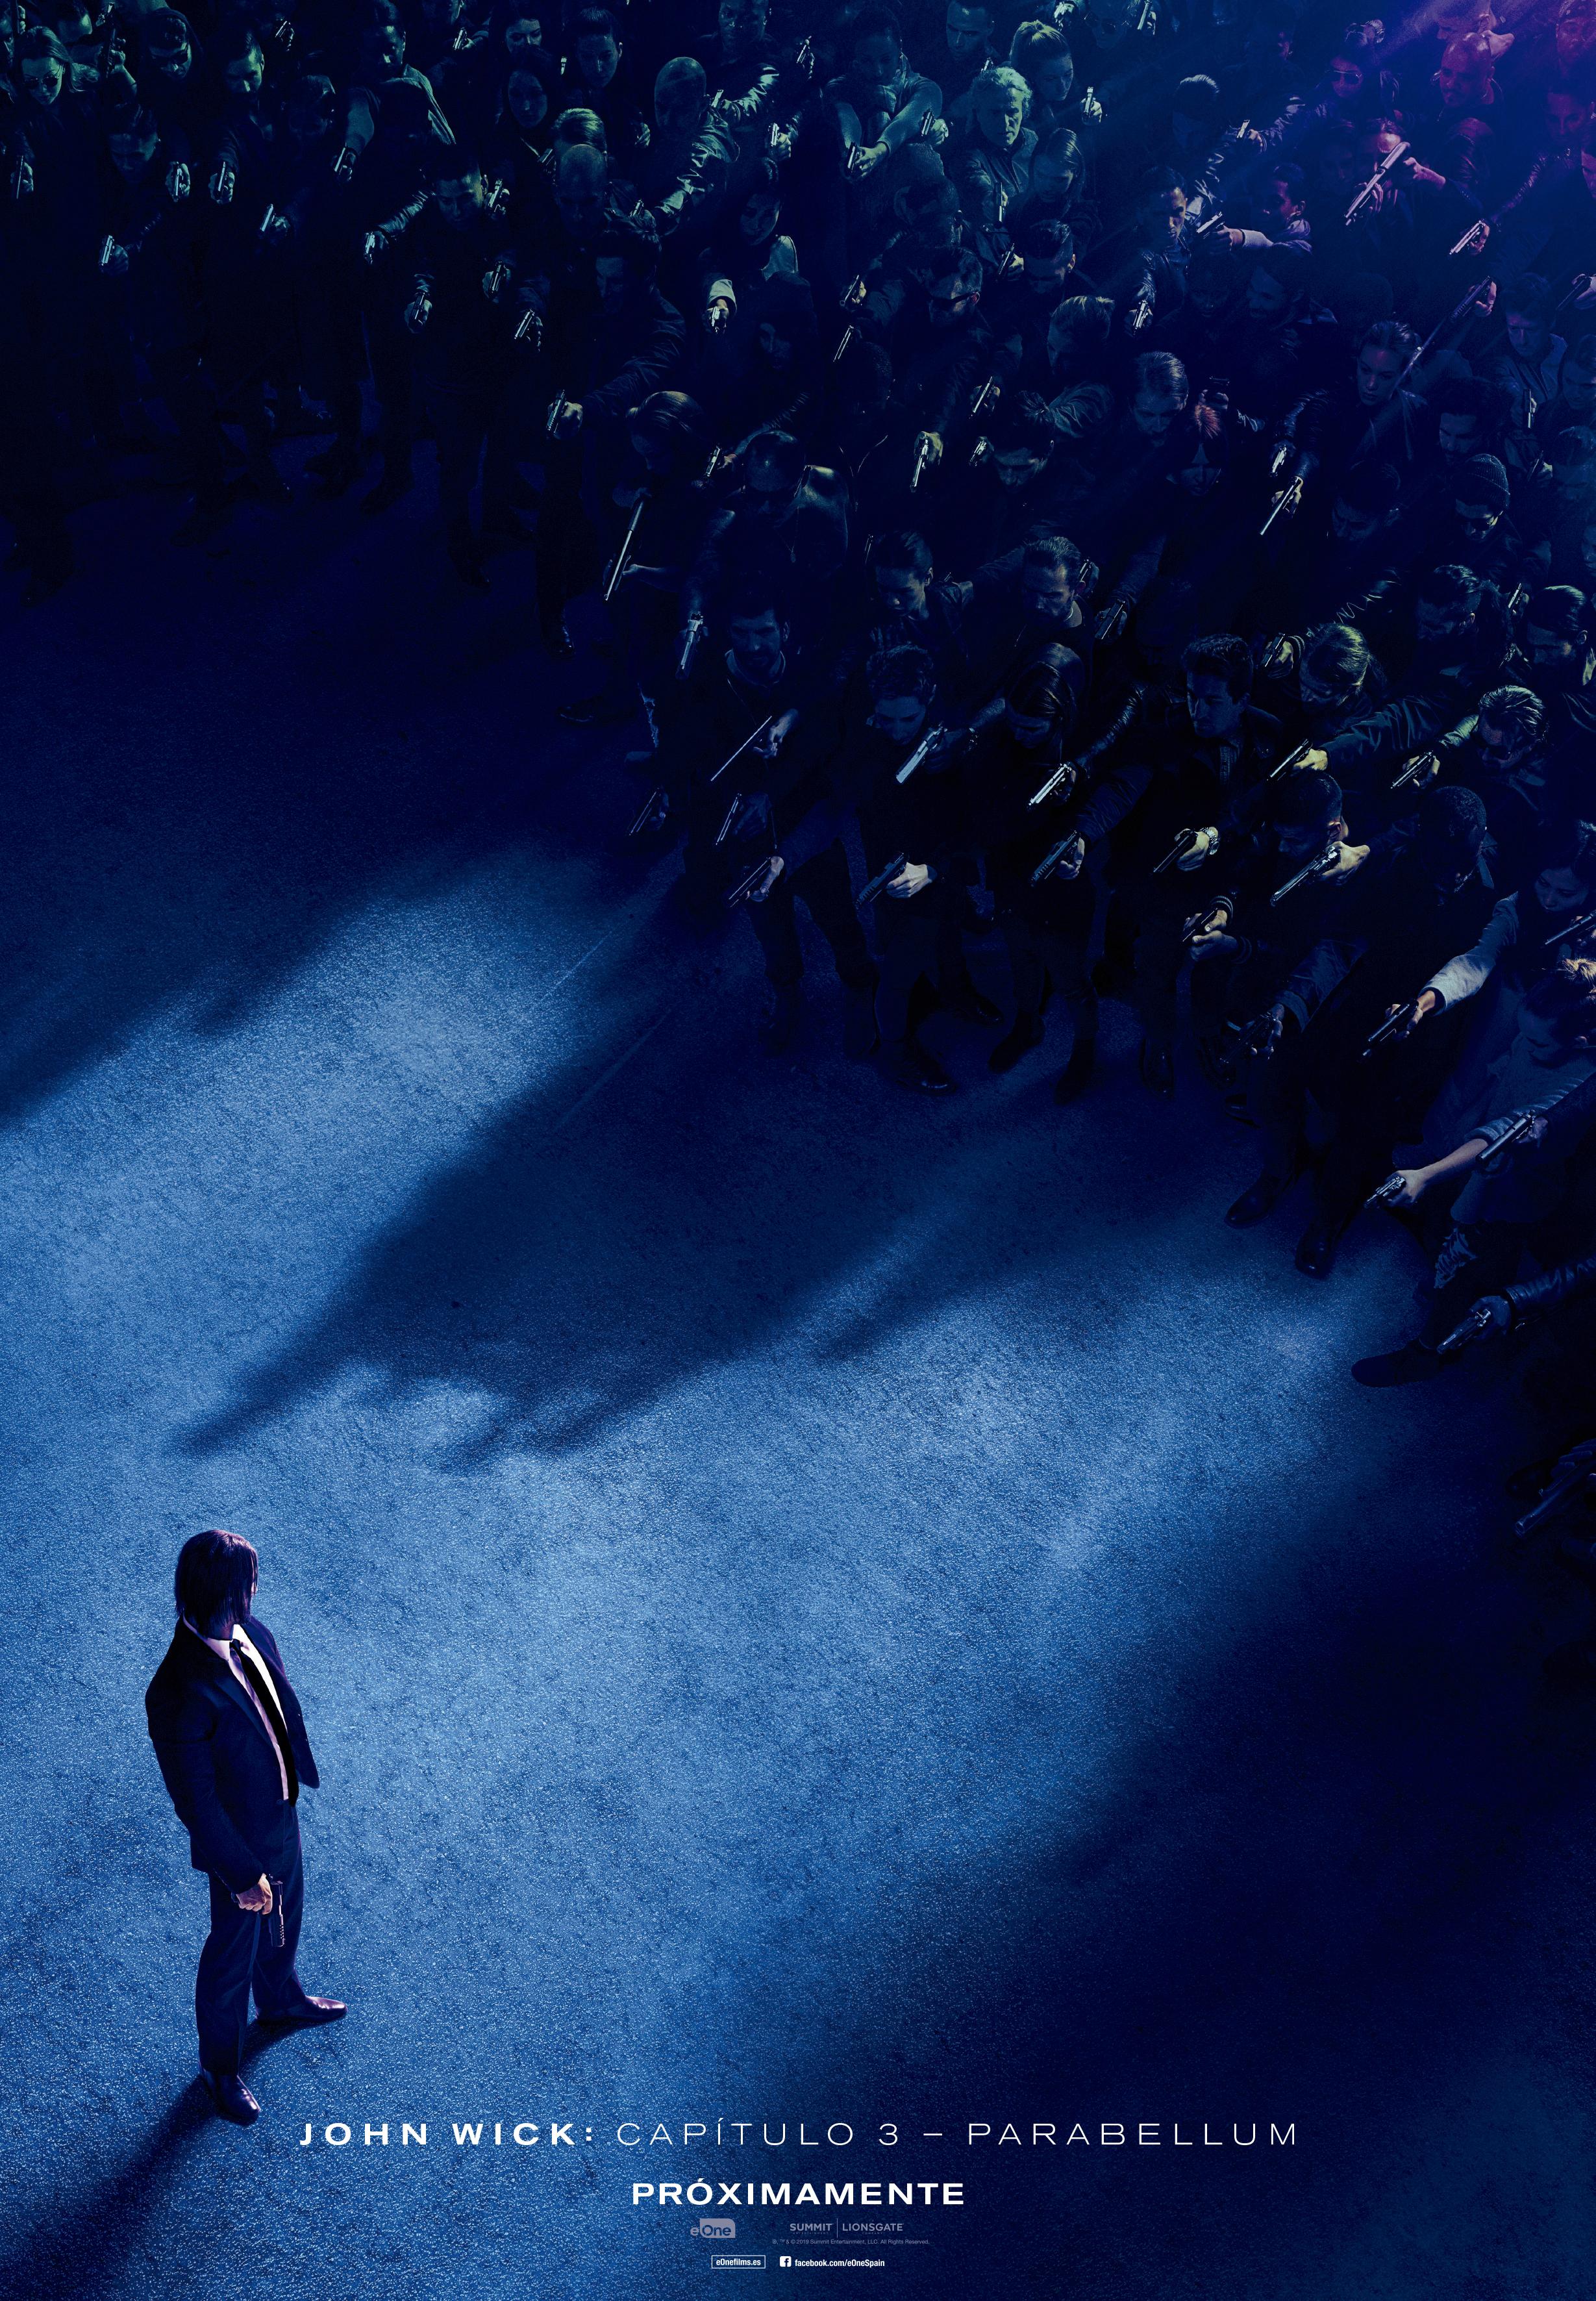 'John Wick: Capítulo 3 - Parabellum': Teaser póster y fecha de estreno en España